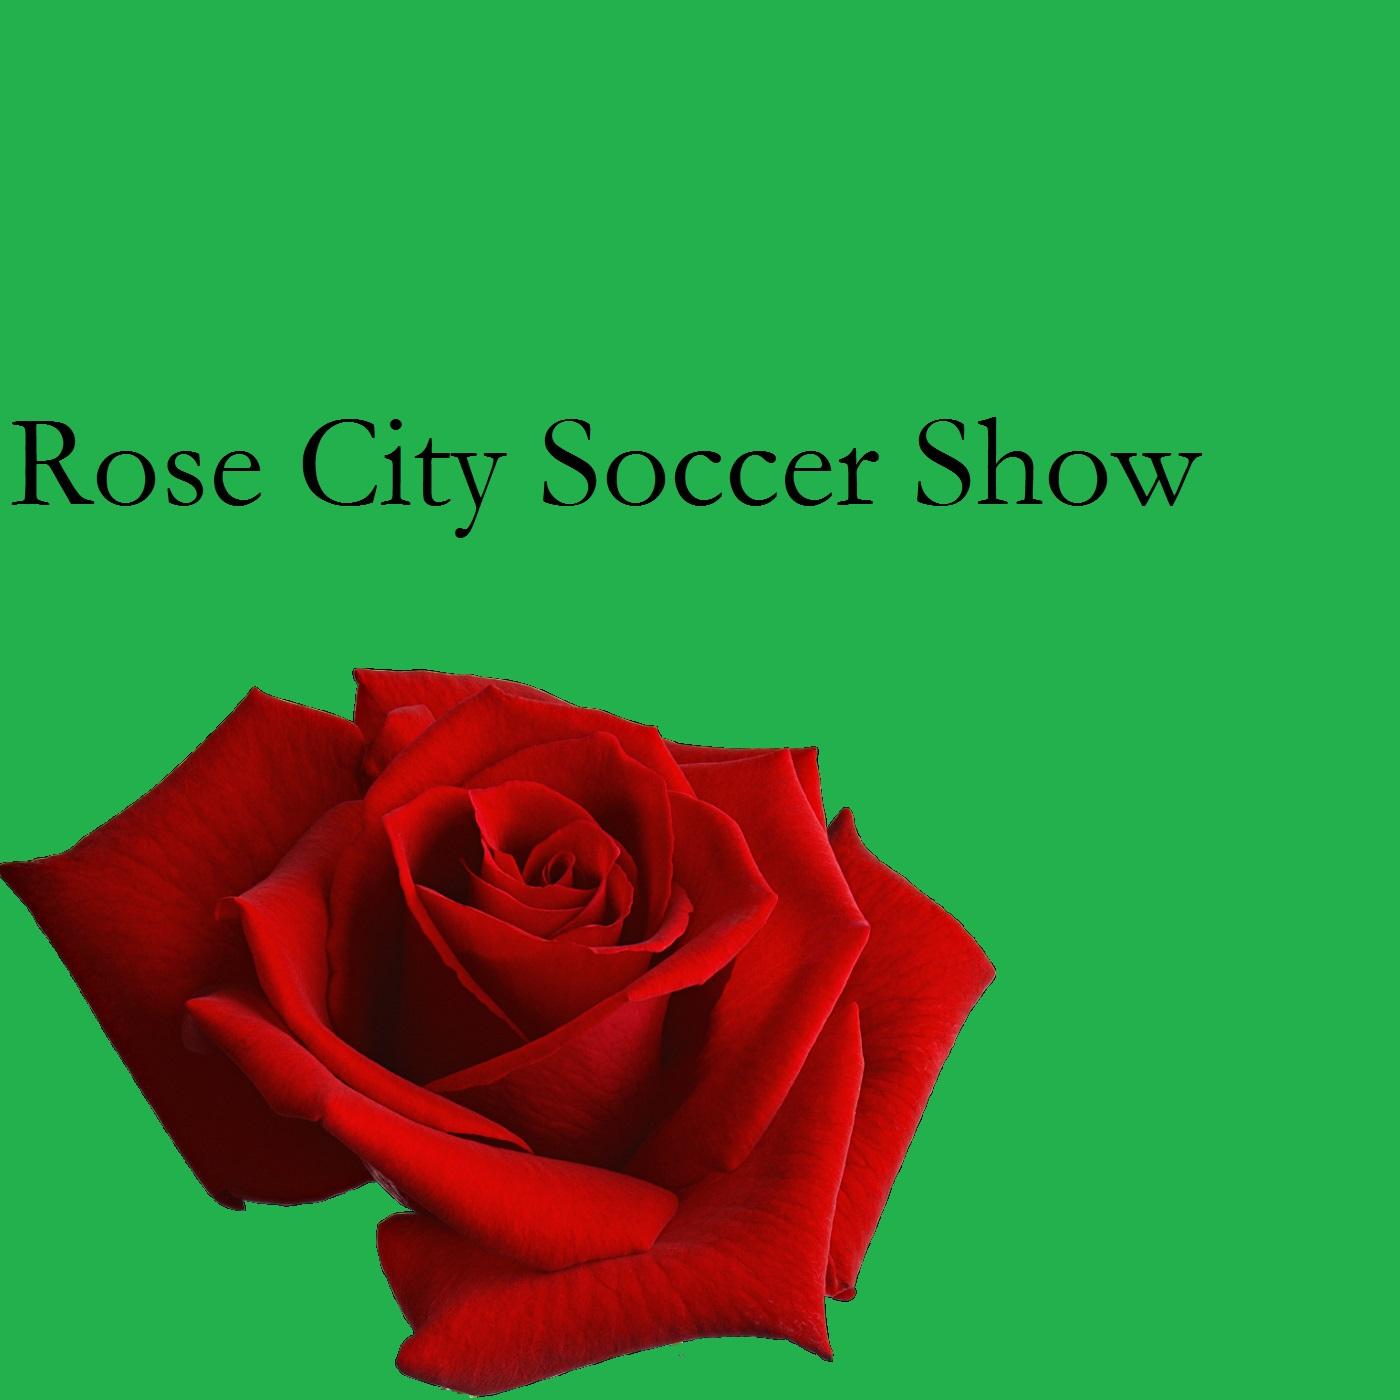 RoseCitySoccerShow